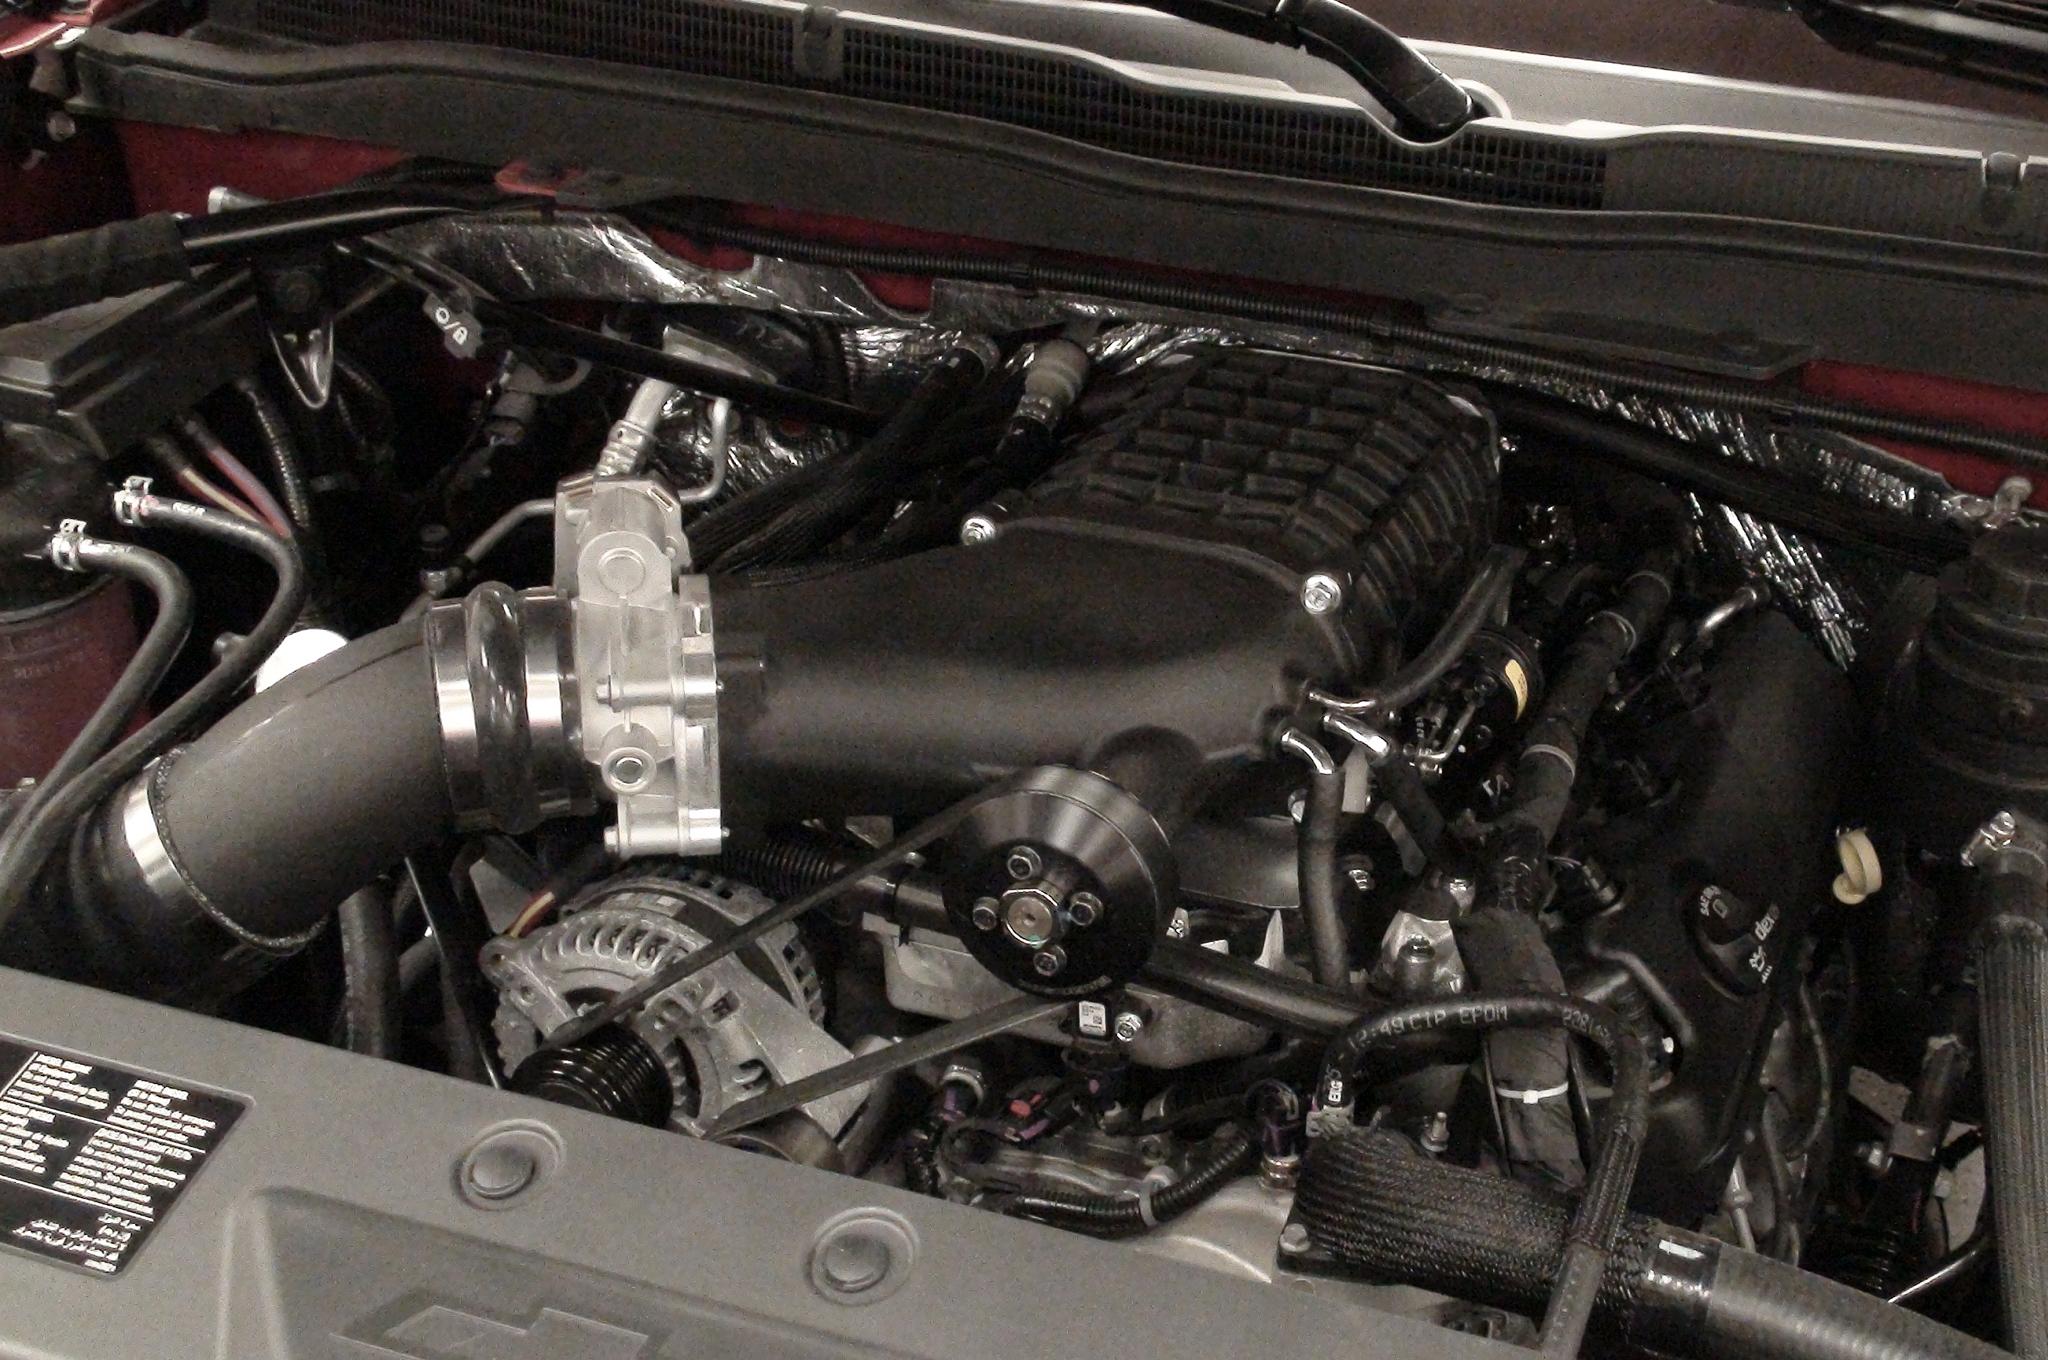 2014 Chevrolet Silverado Reaper The Inside Story Photo Image Gallery